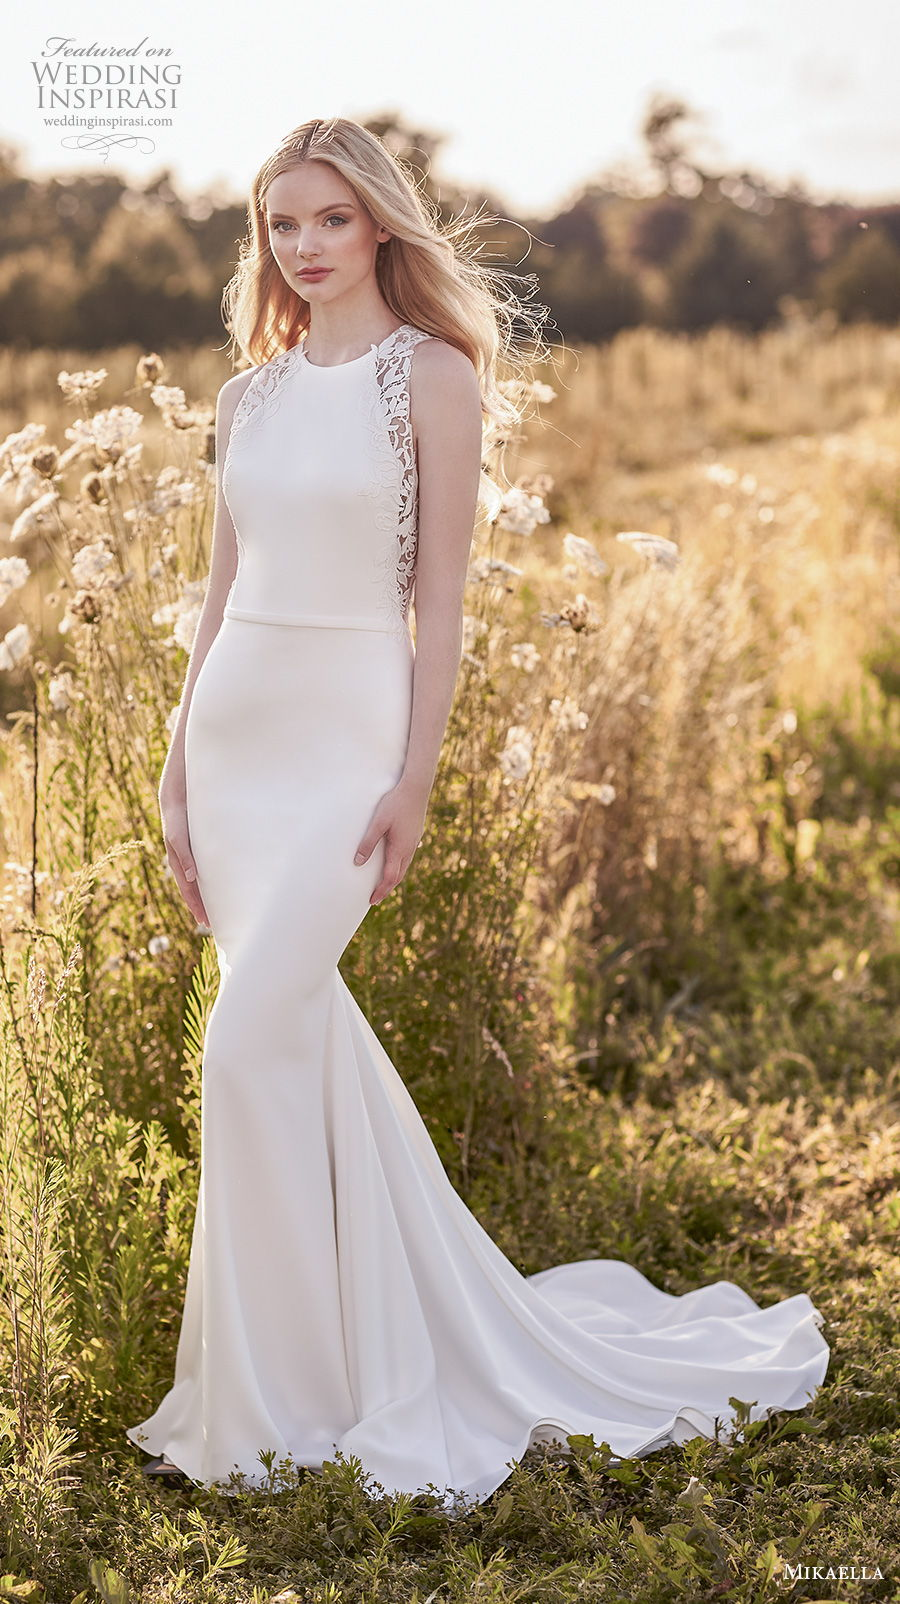 mikaella spring 2020 bridal sleeveless halter jewel neck simple minimalist elegant fit and flare sheath wedding dress keyhole low back short train (11) mv